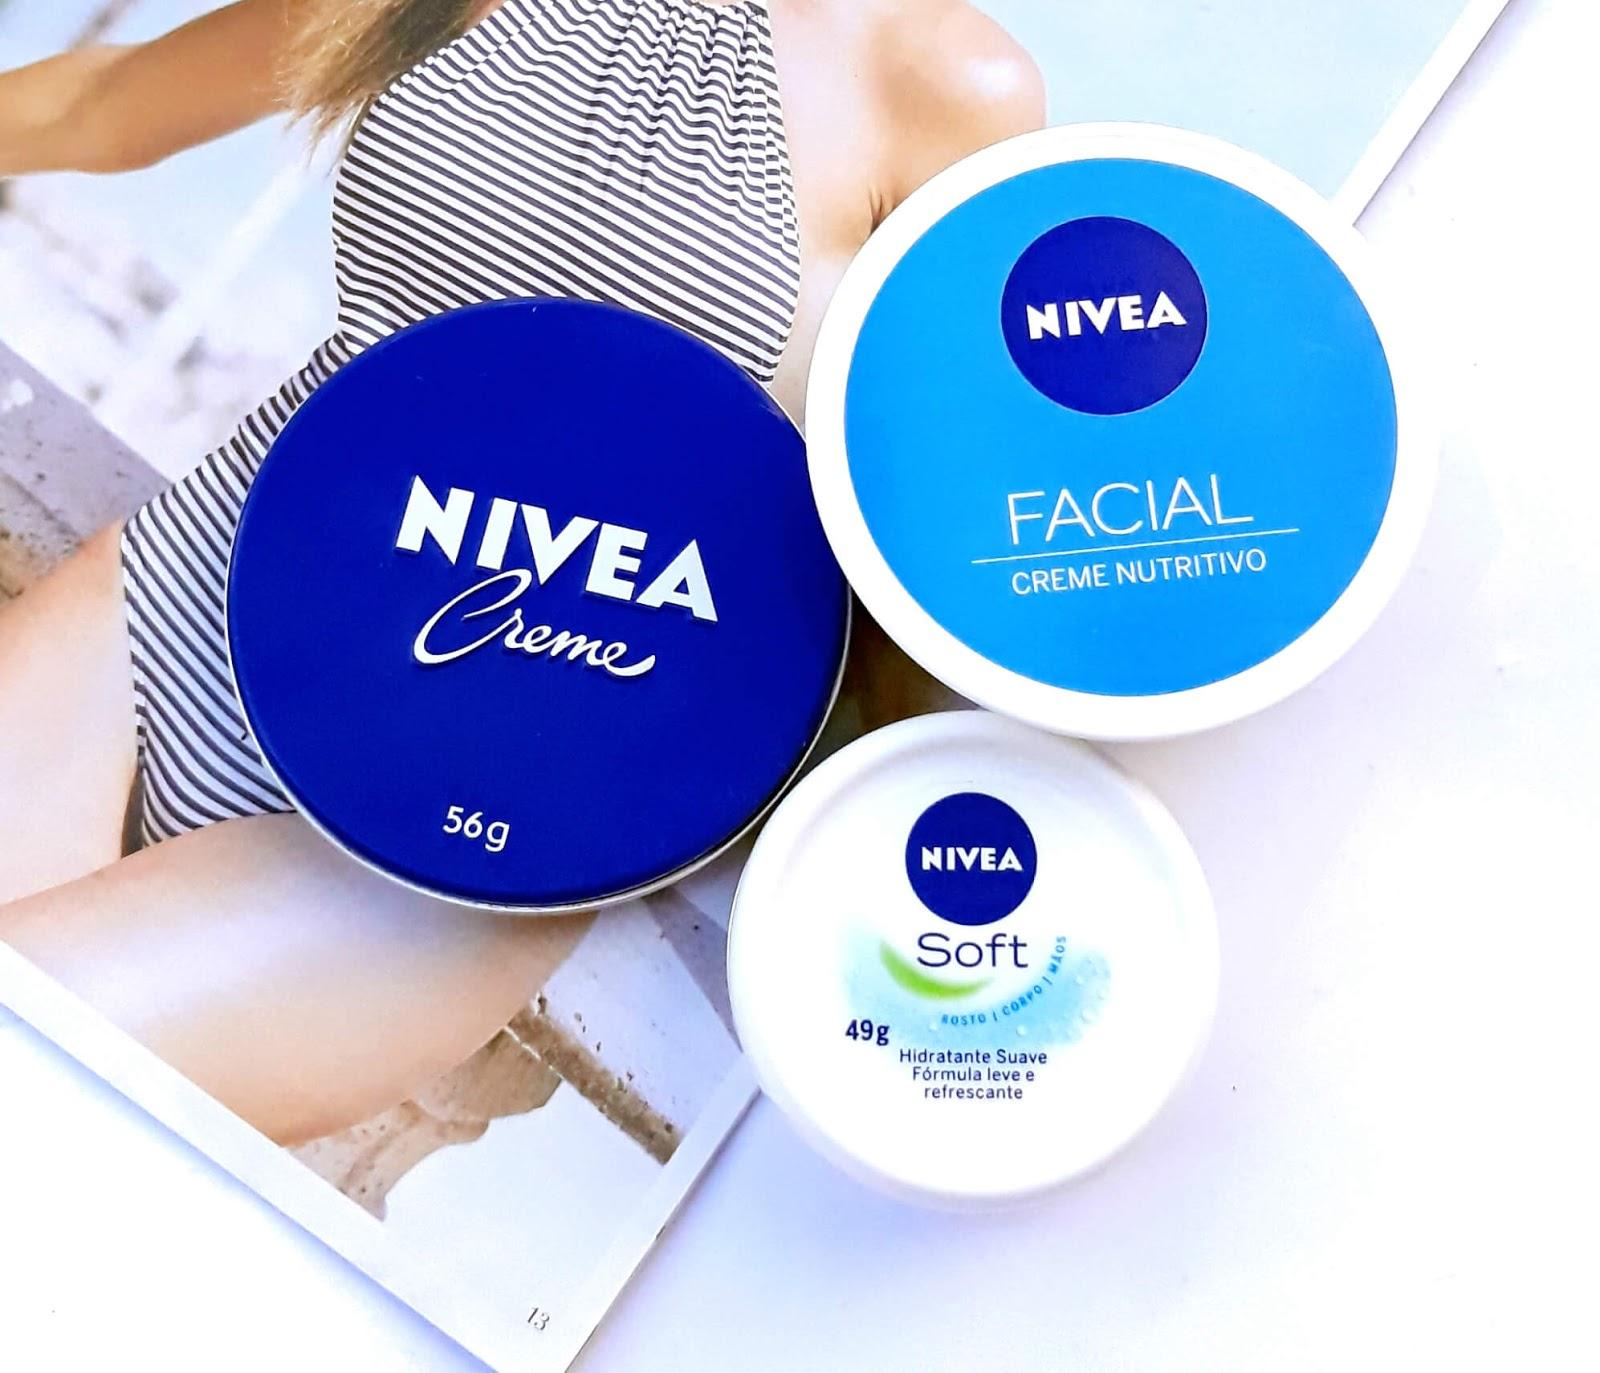 Nivea creme latinha azul, Nivea Soft e Nivea Facial Creme Nutritivo